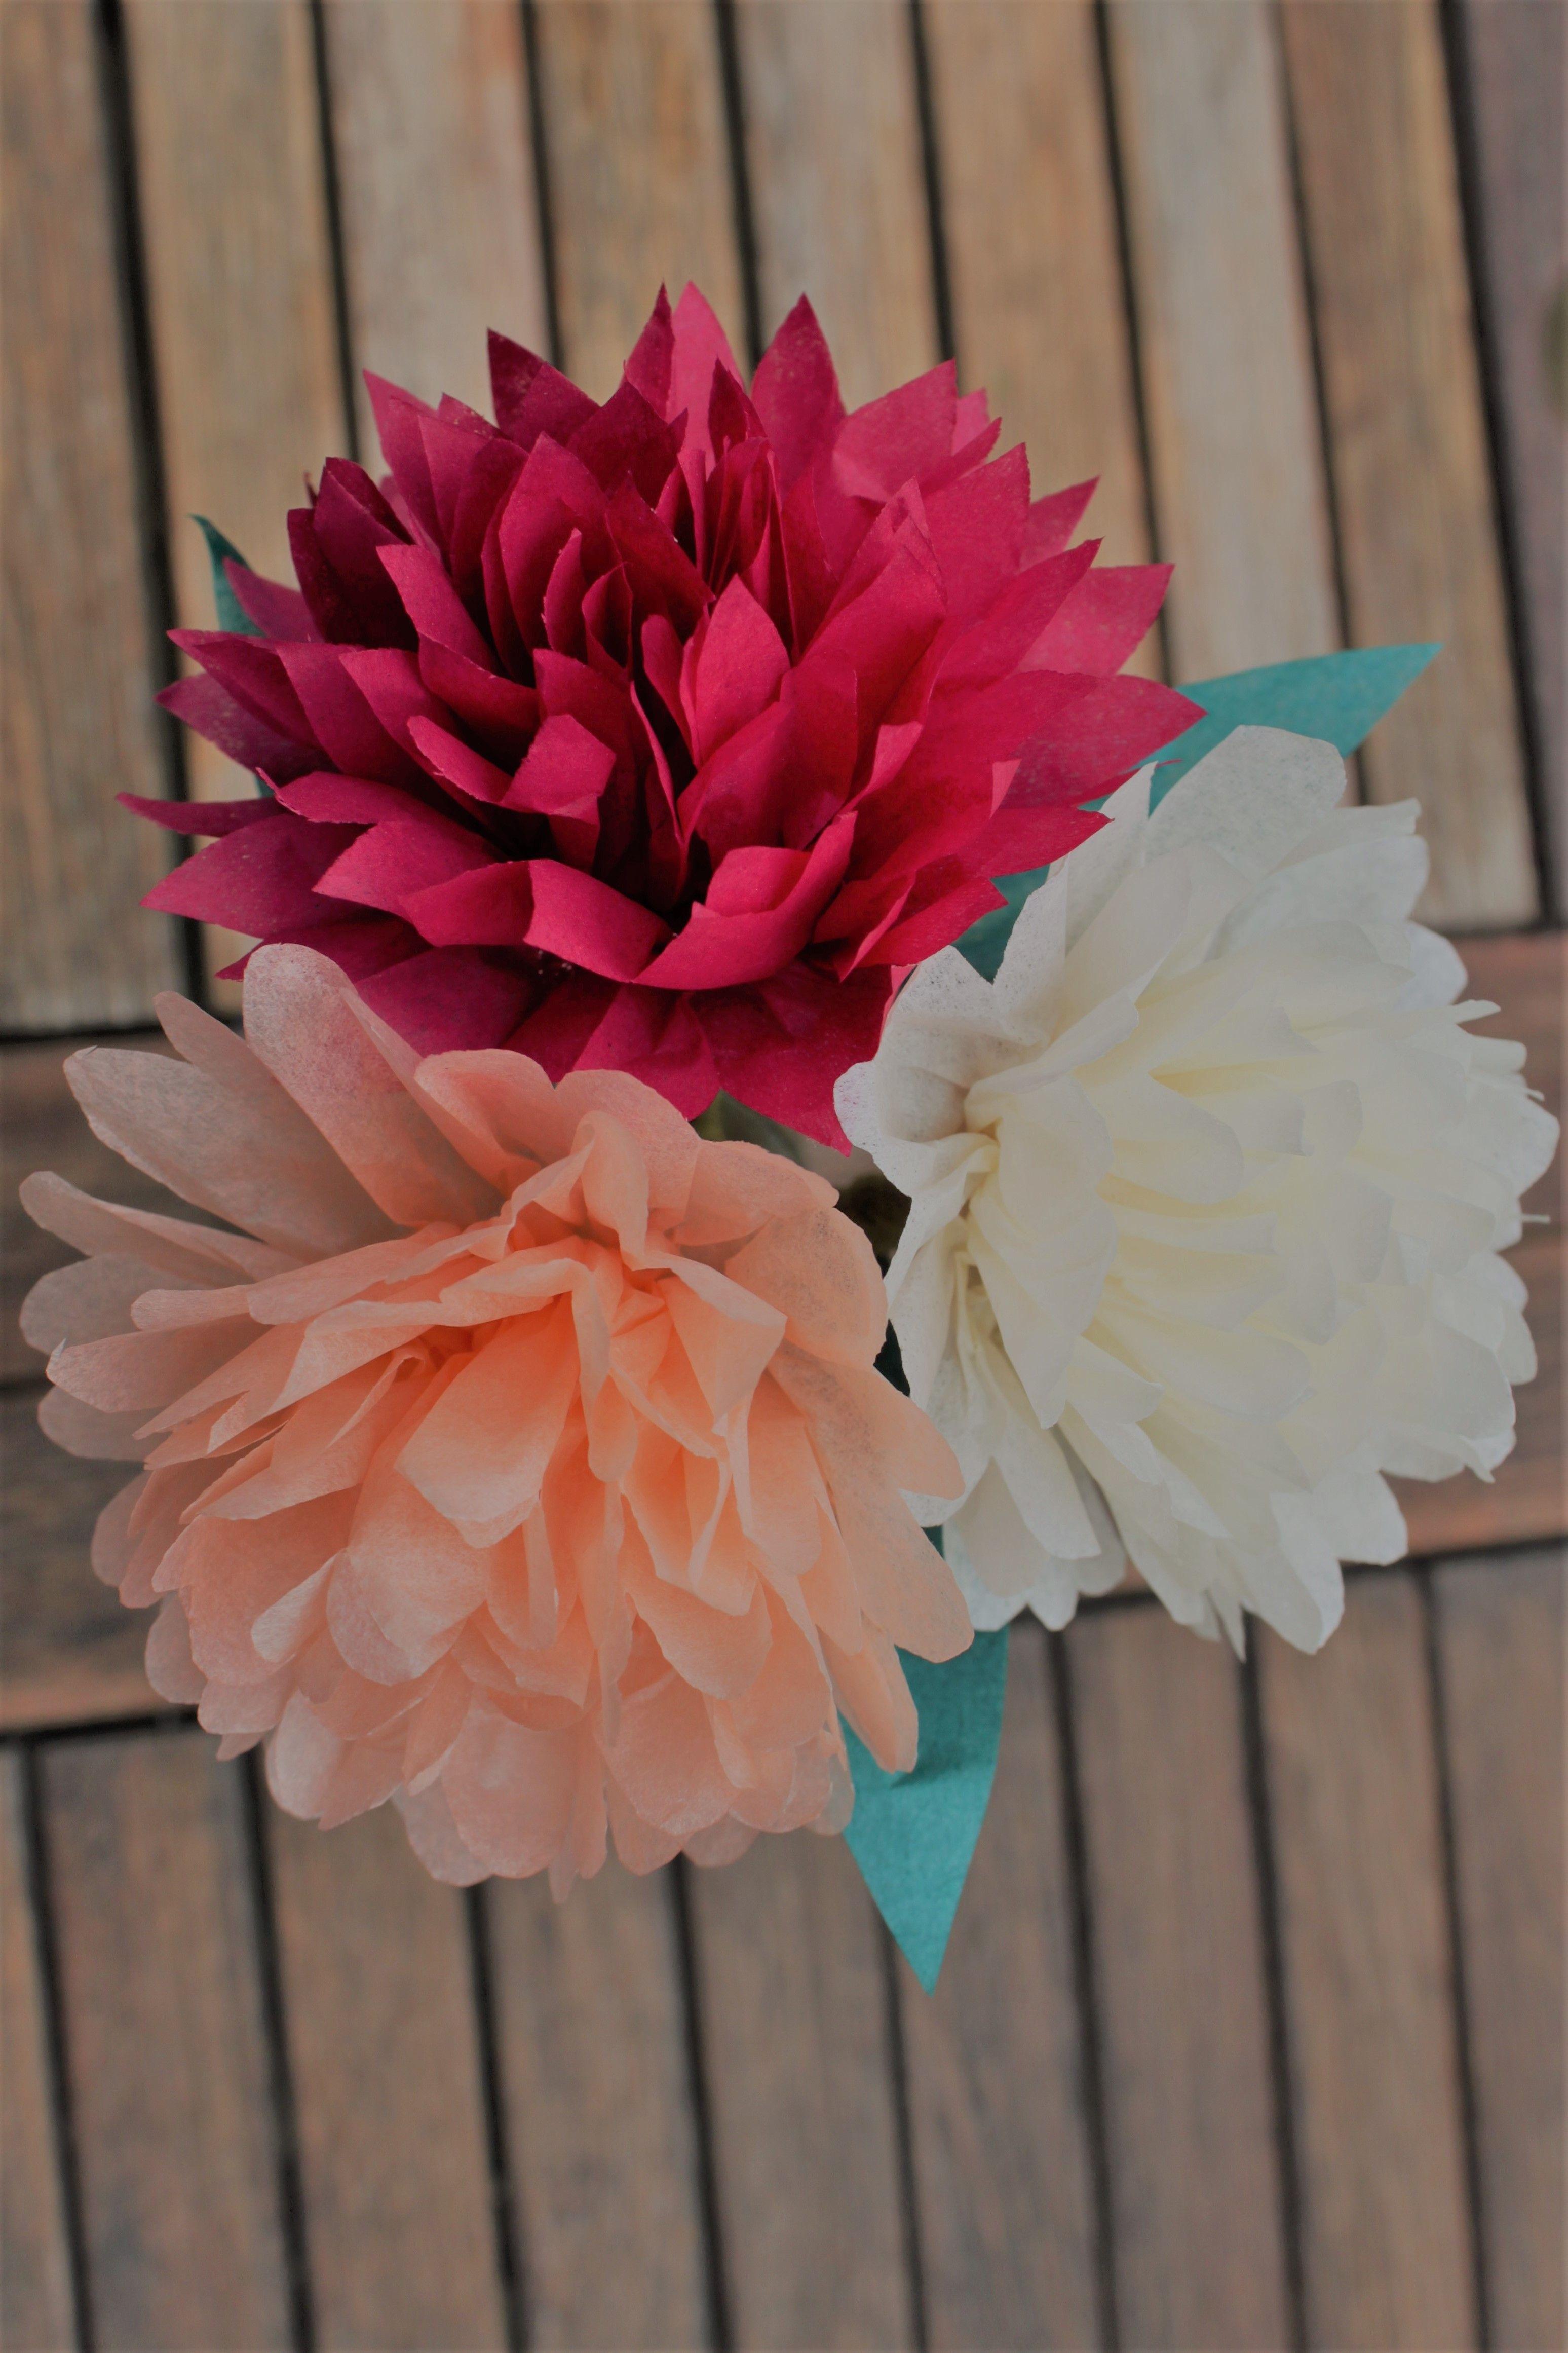 Tissue paper flower centerpiece bouquet aisle chair decorations tissue paper flower centerpiece bouquet aisle chair decorations wedding papplewick woods izmirmasajfo